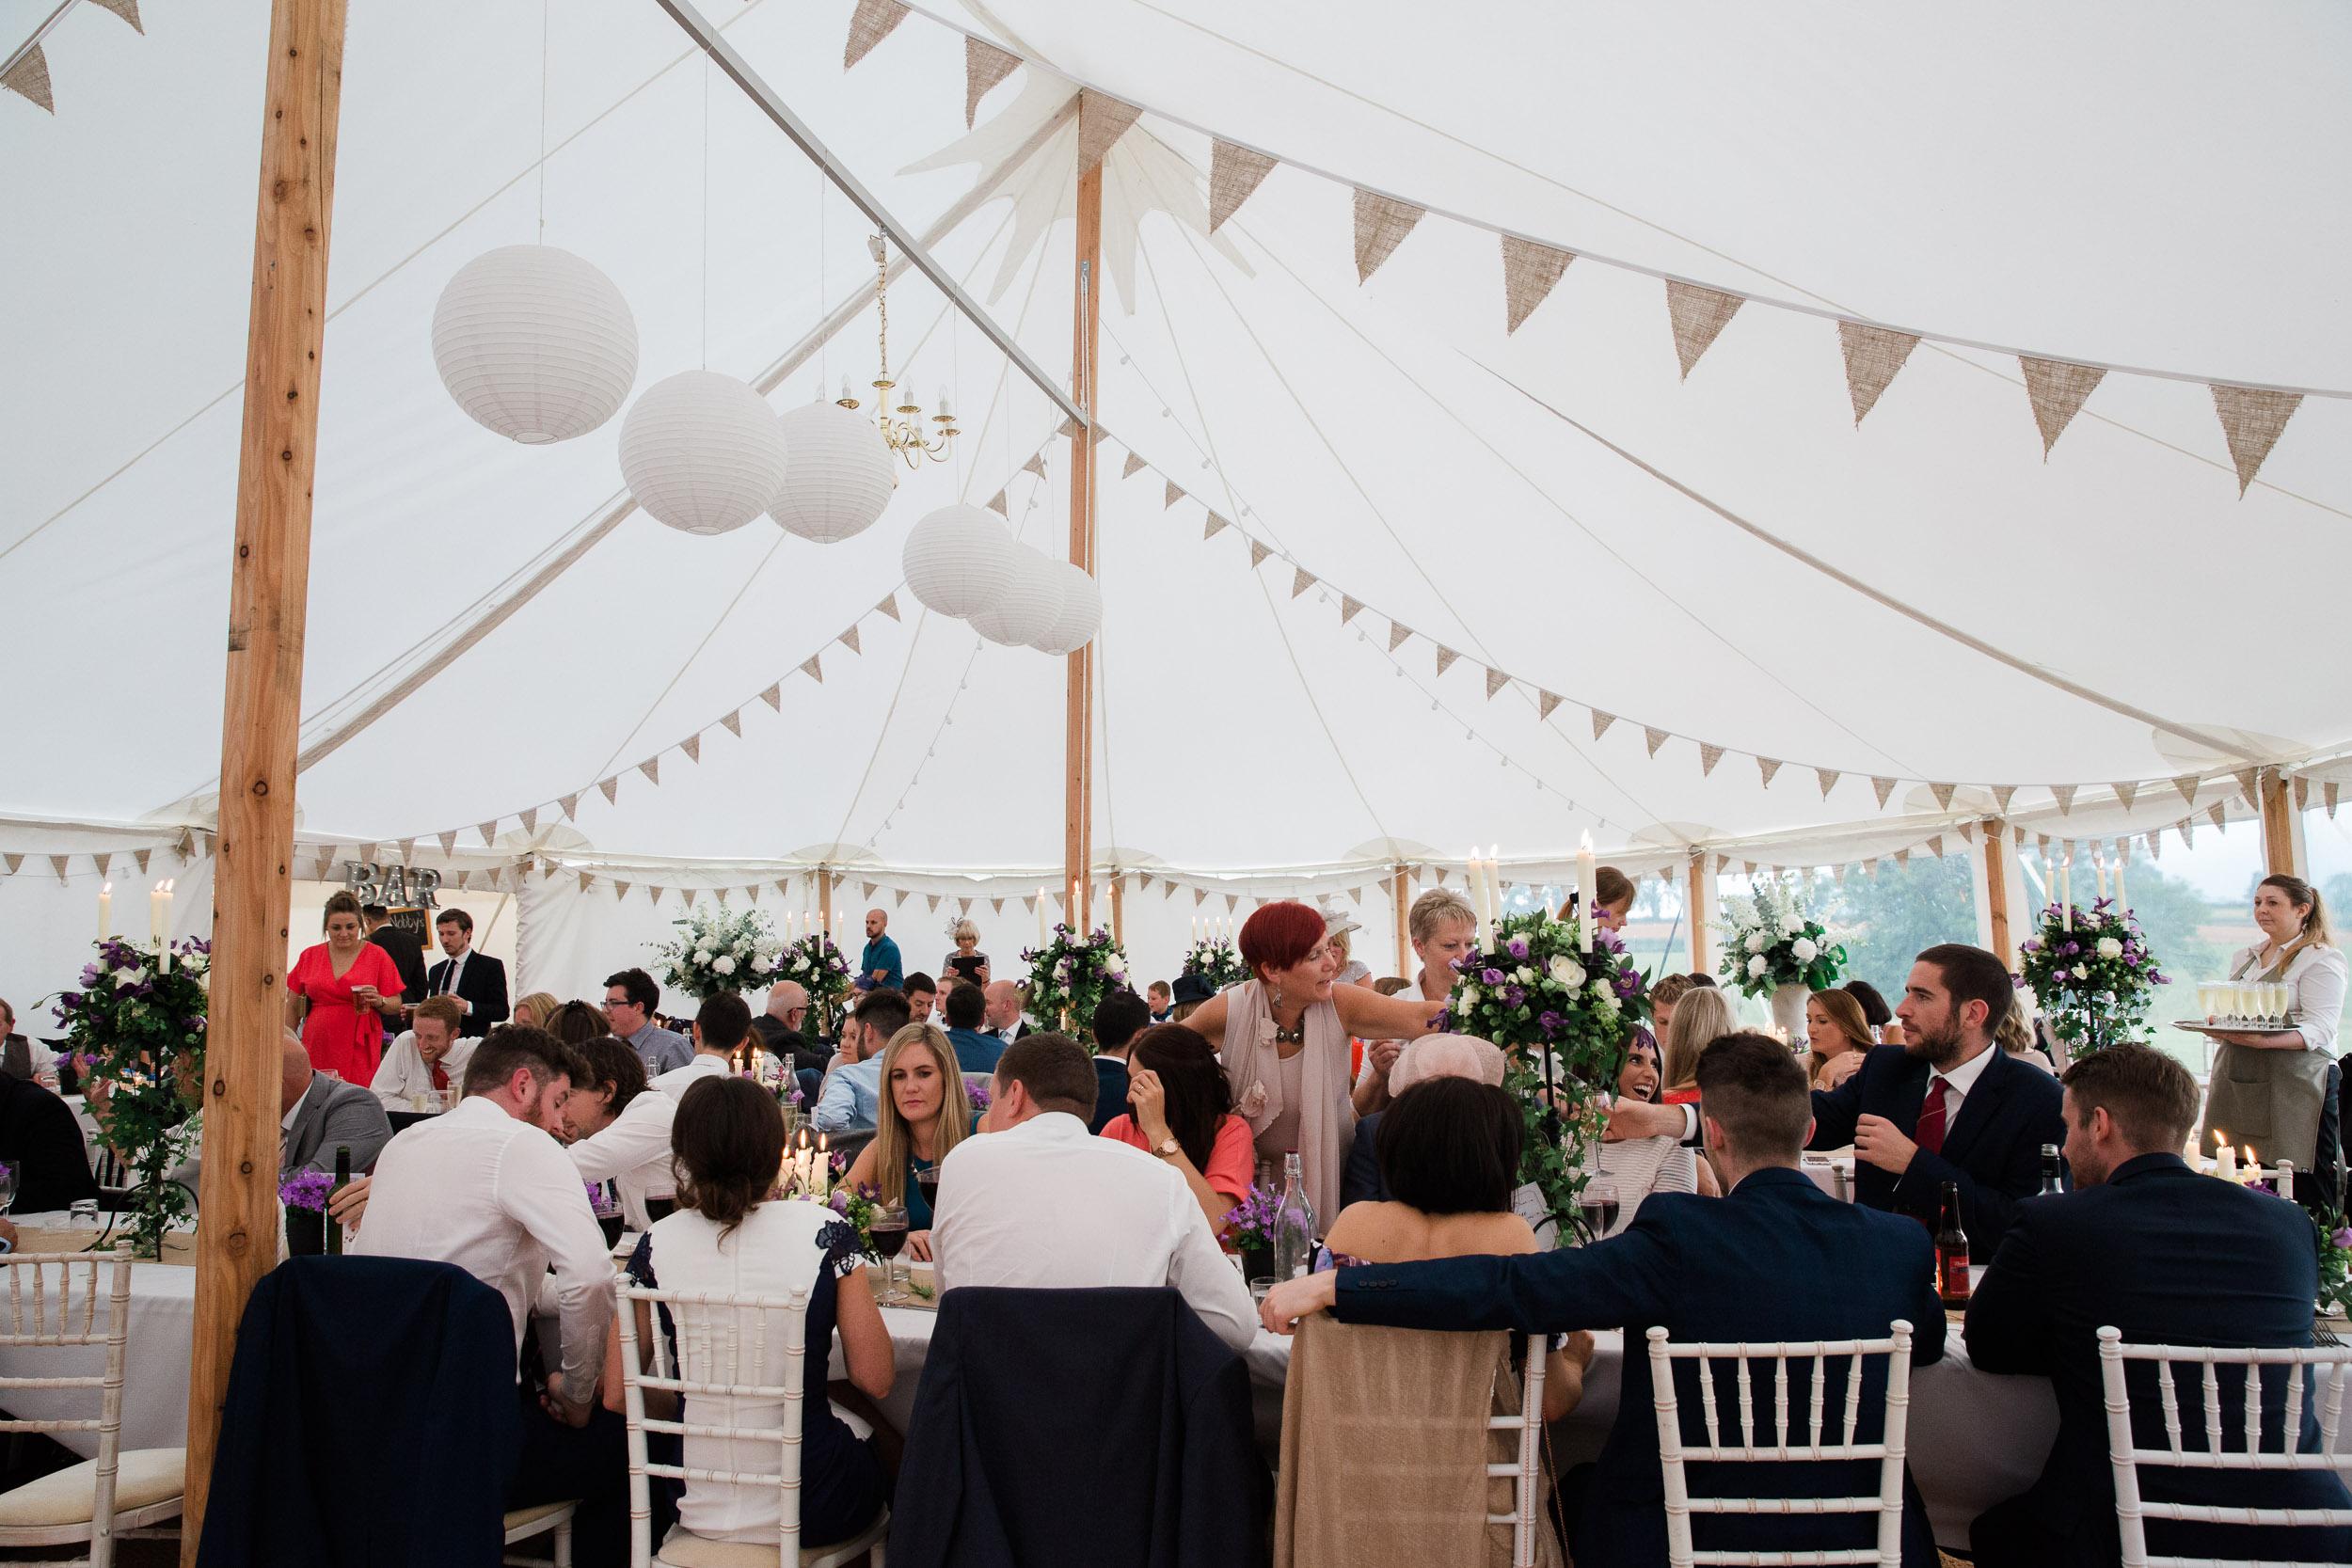 chic-rustic-home-farm-wedding-157